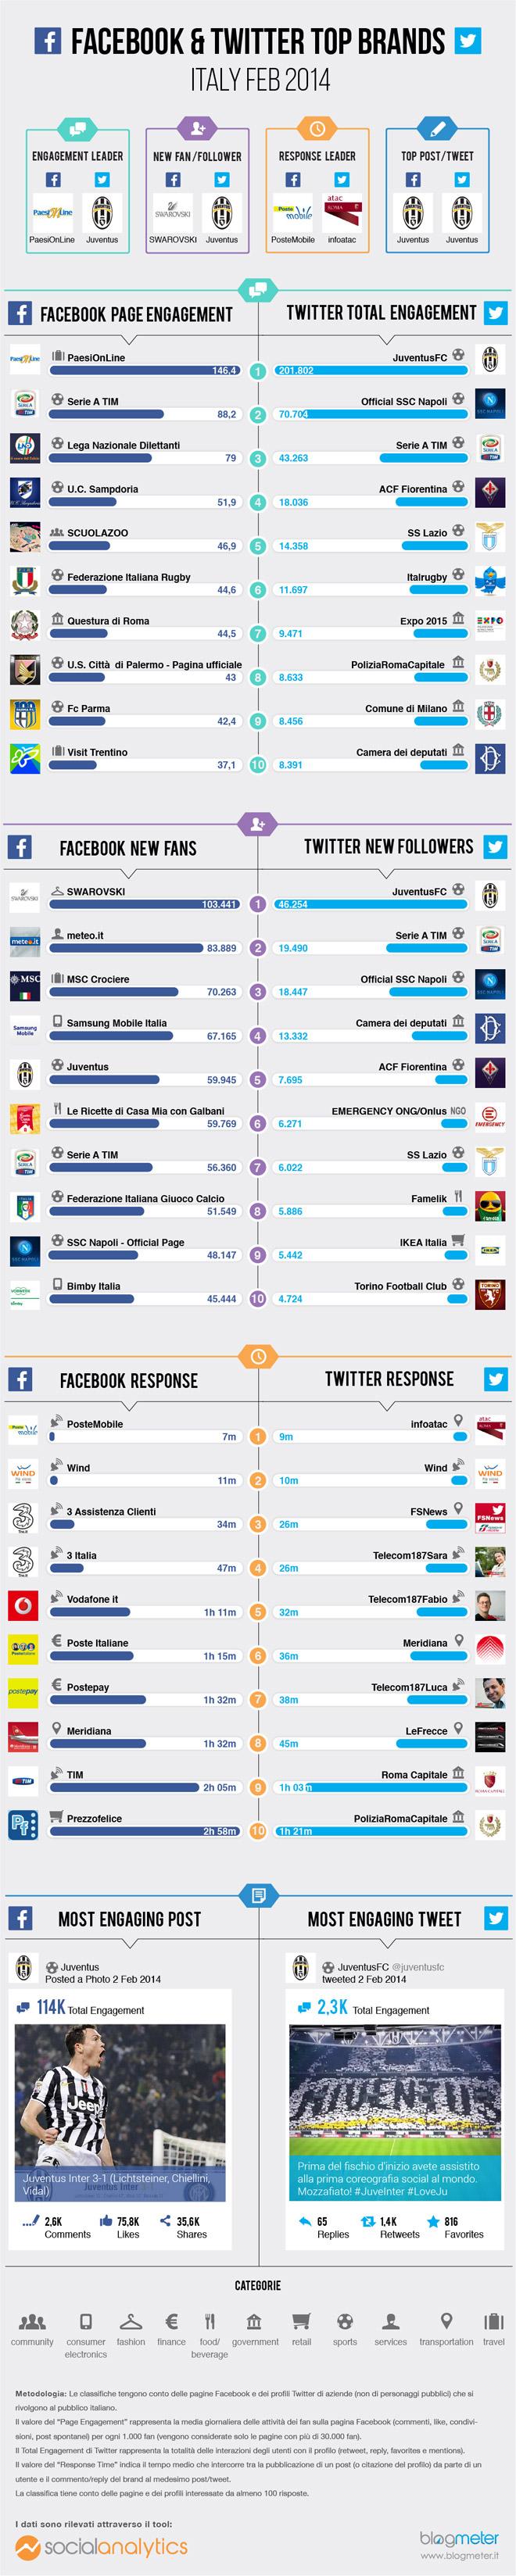 juventus facebook-top-brand-febbraio-2014-blogmeter-infografica